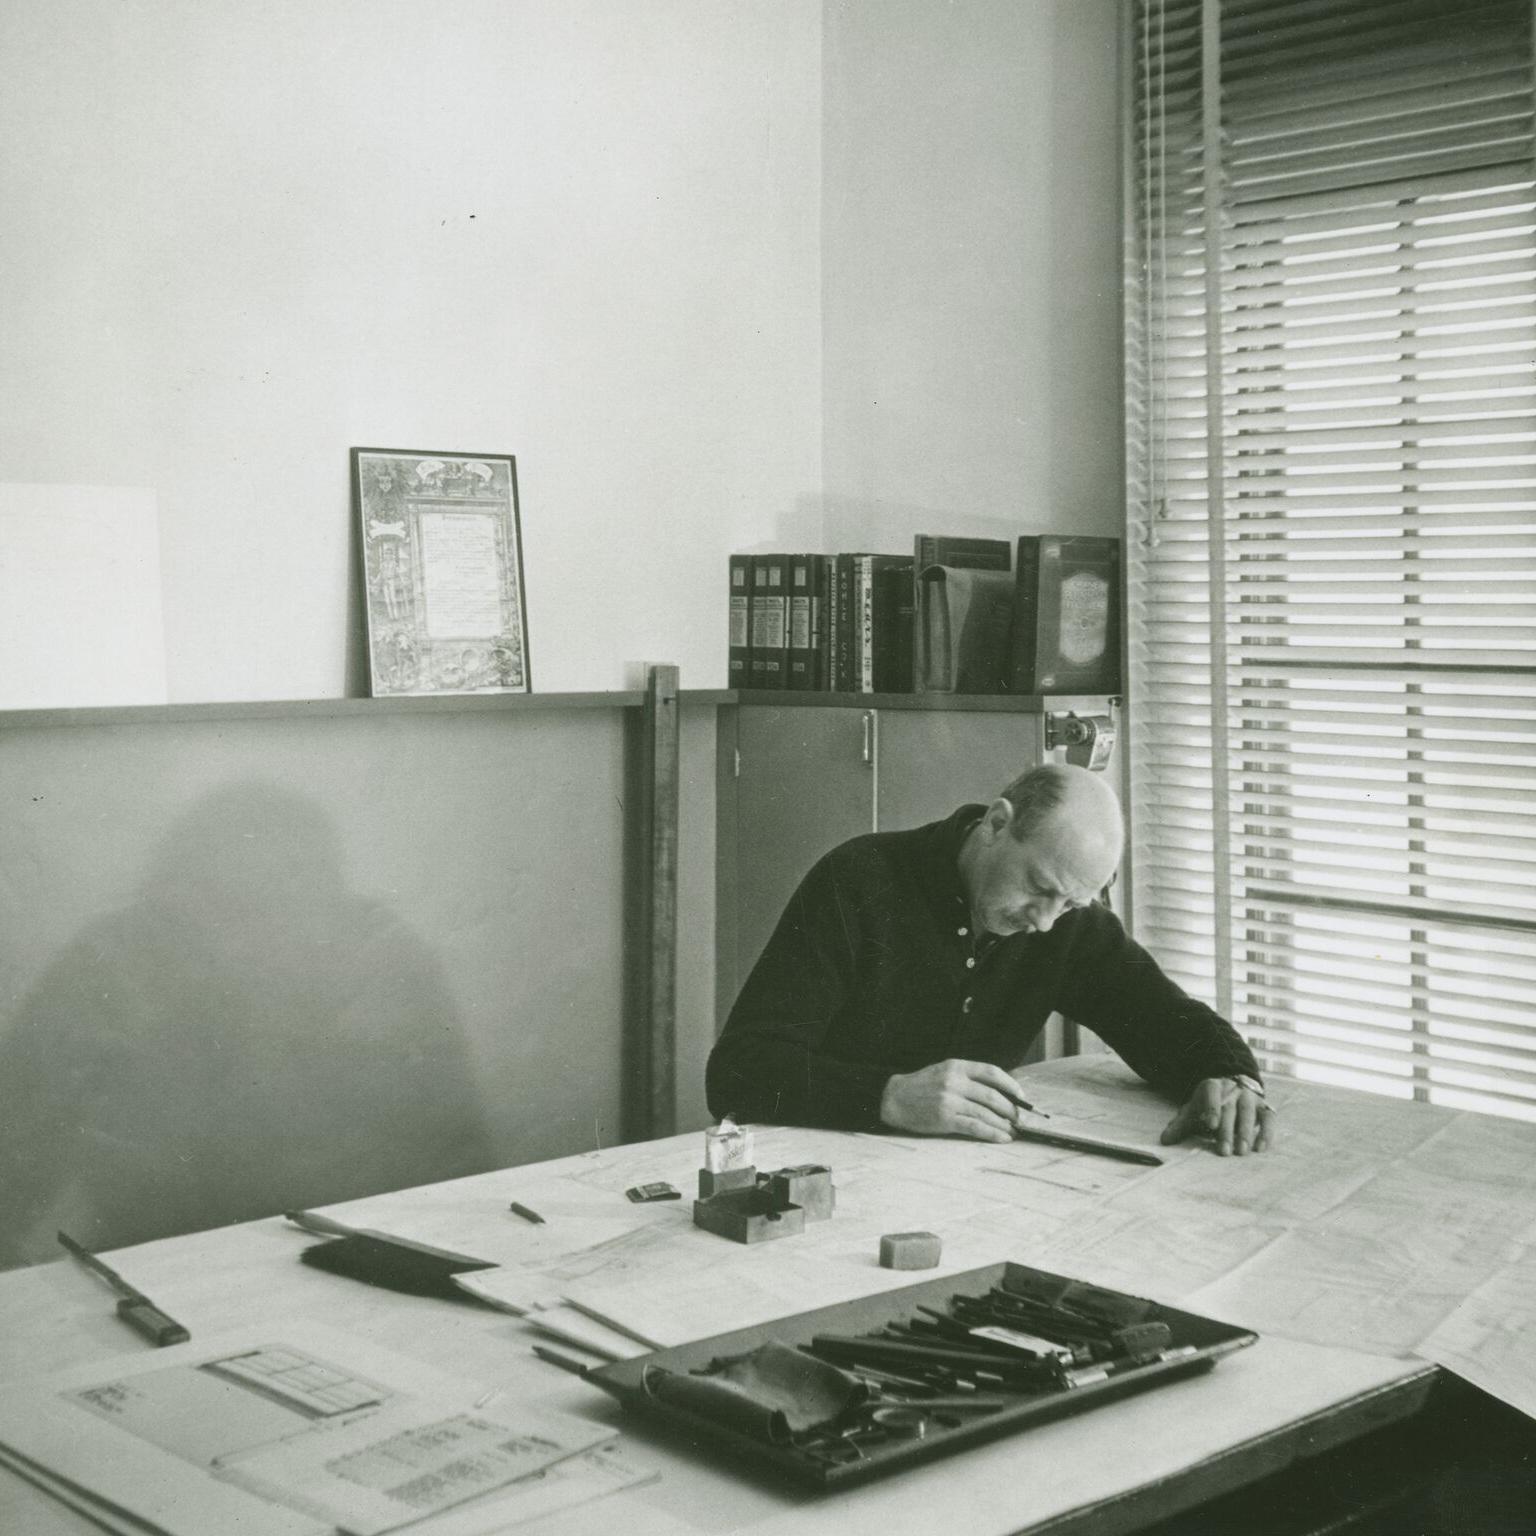 The importance of Kem Weber, Walt Disney's design guru